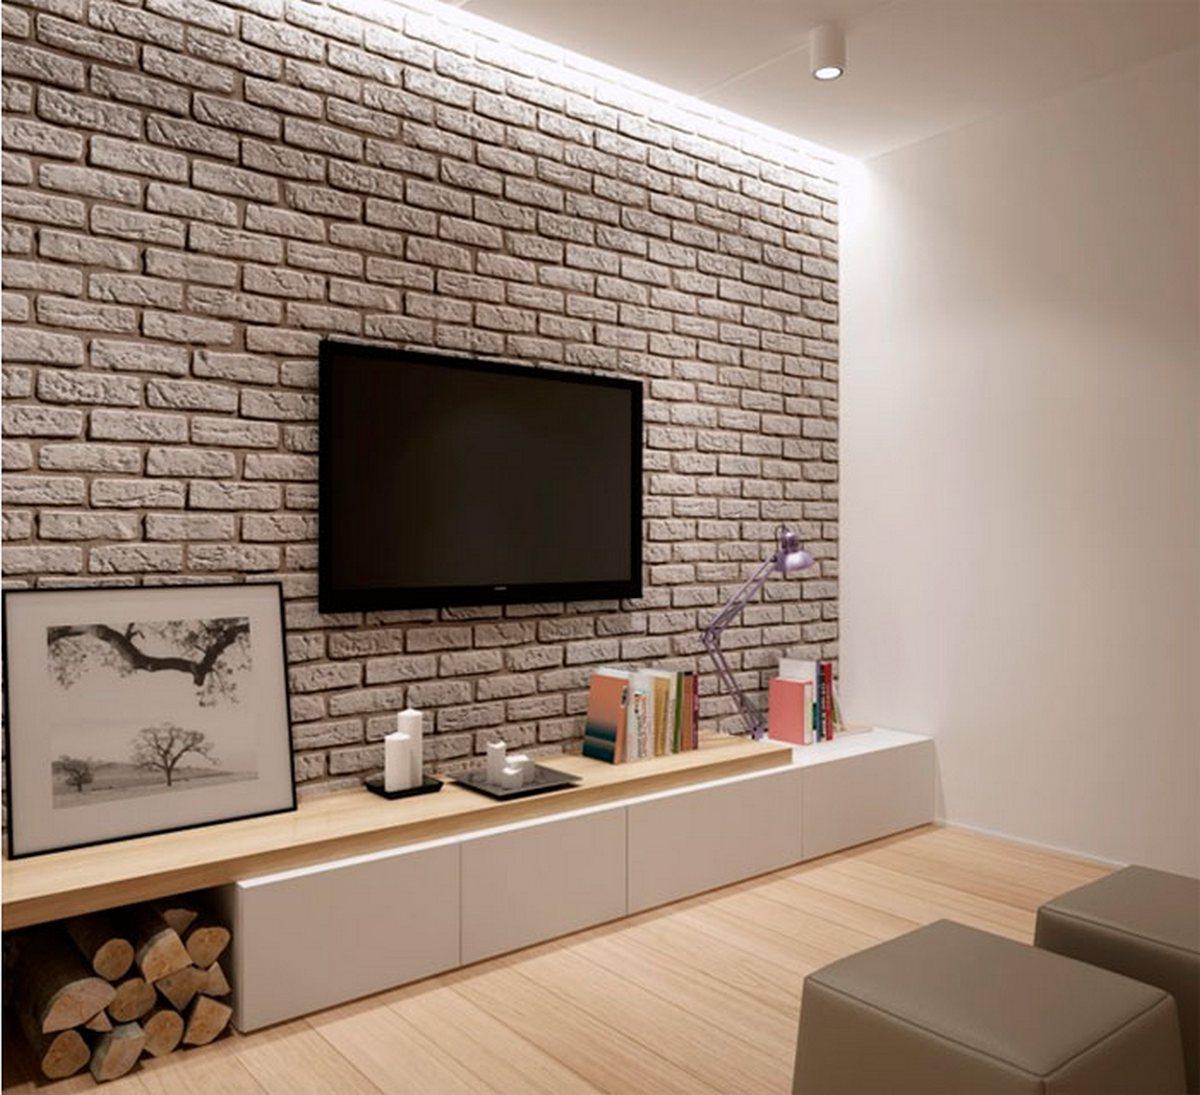 декоративный кирпич в комнате с обоями фото